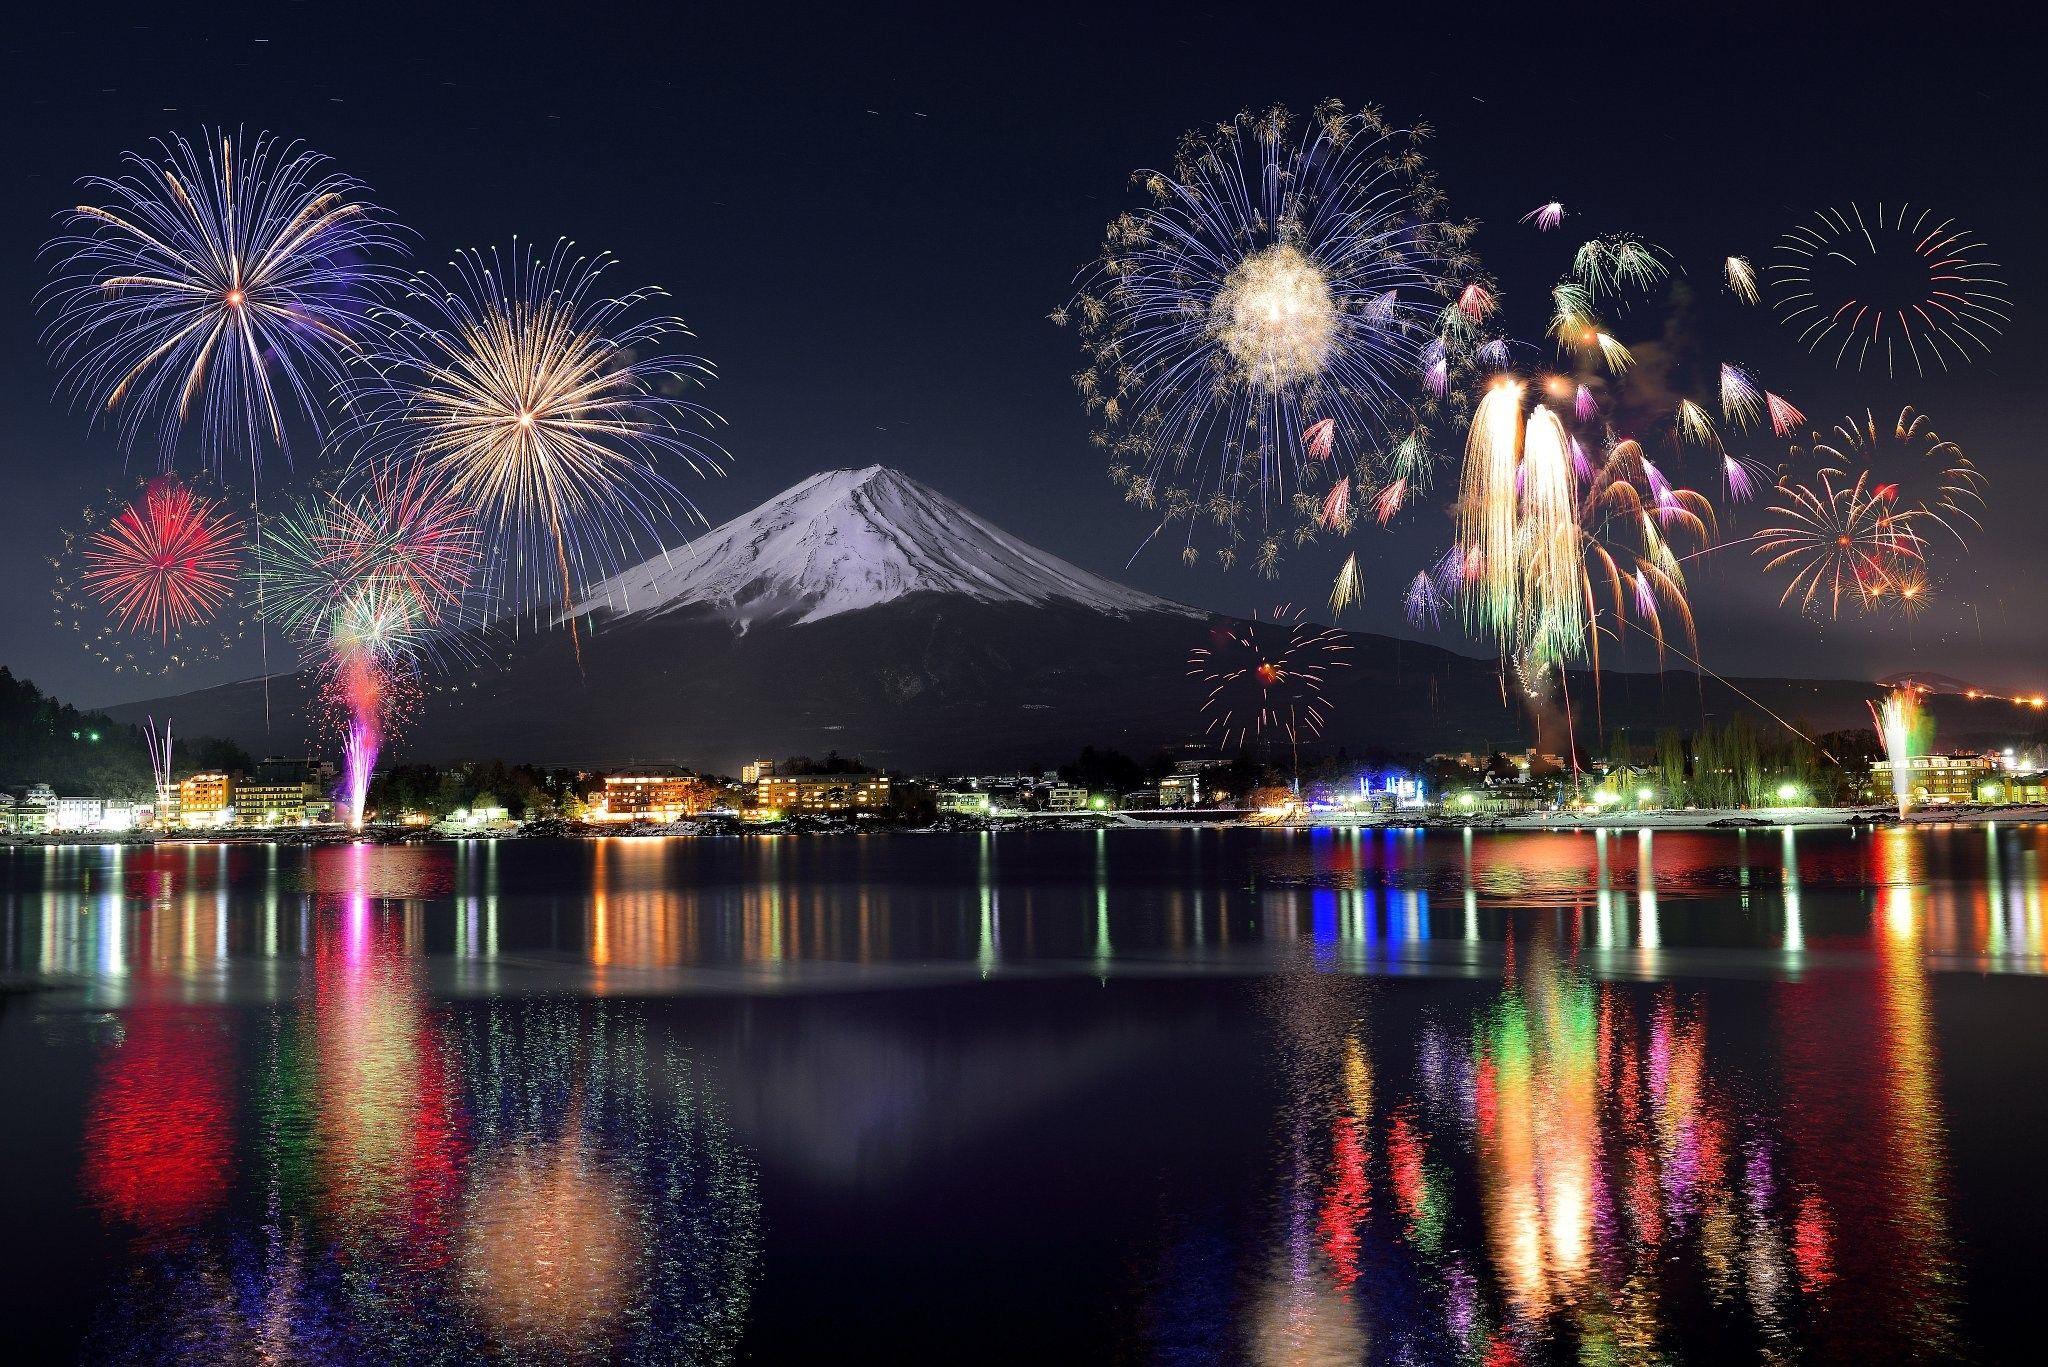 festival kembang api musim panas